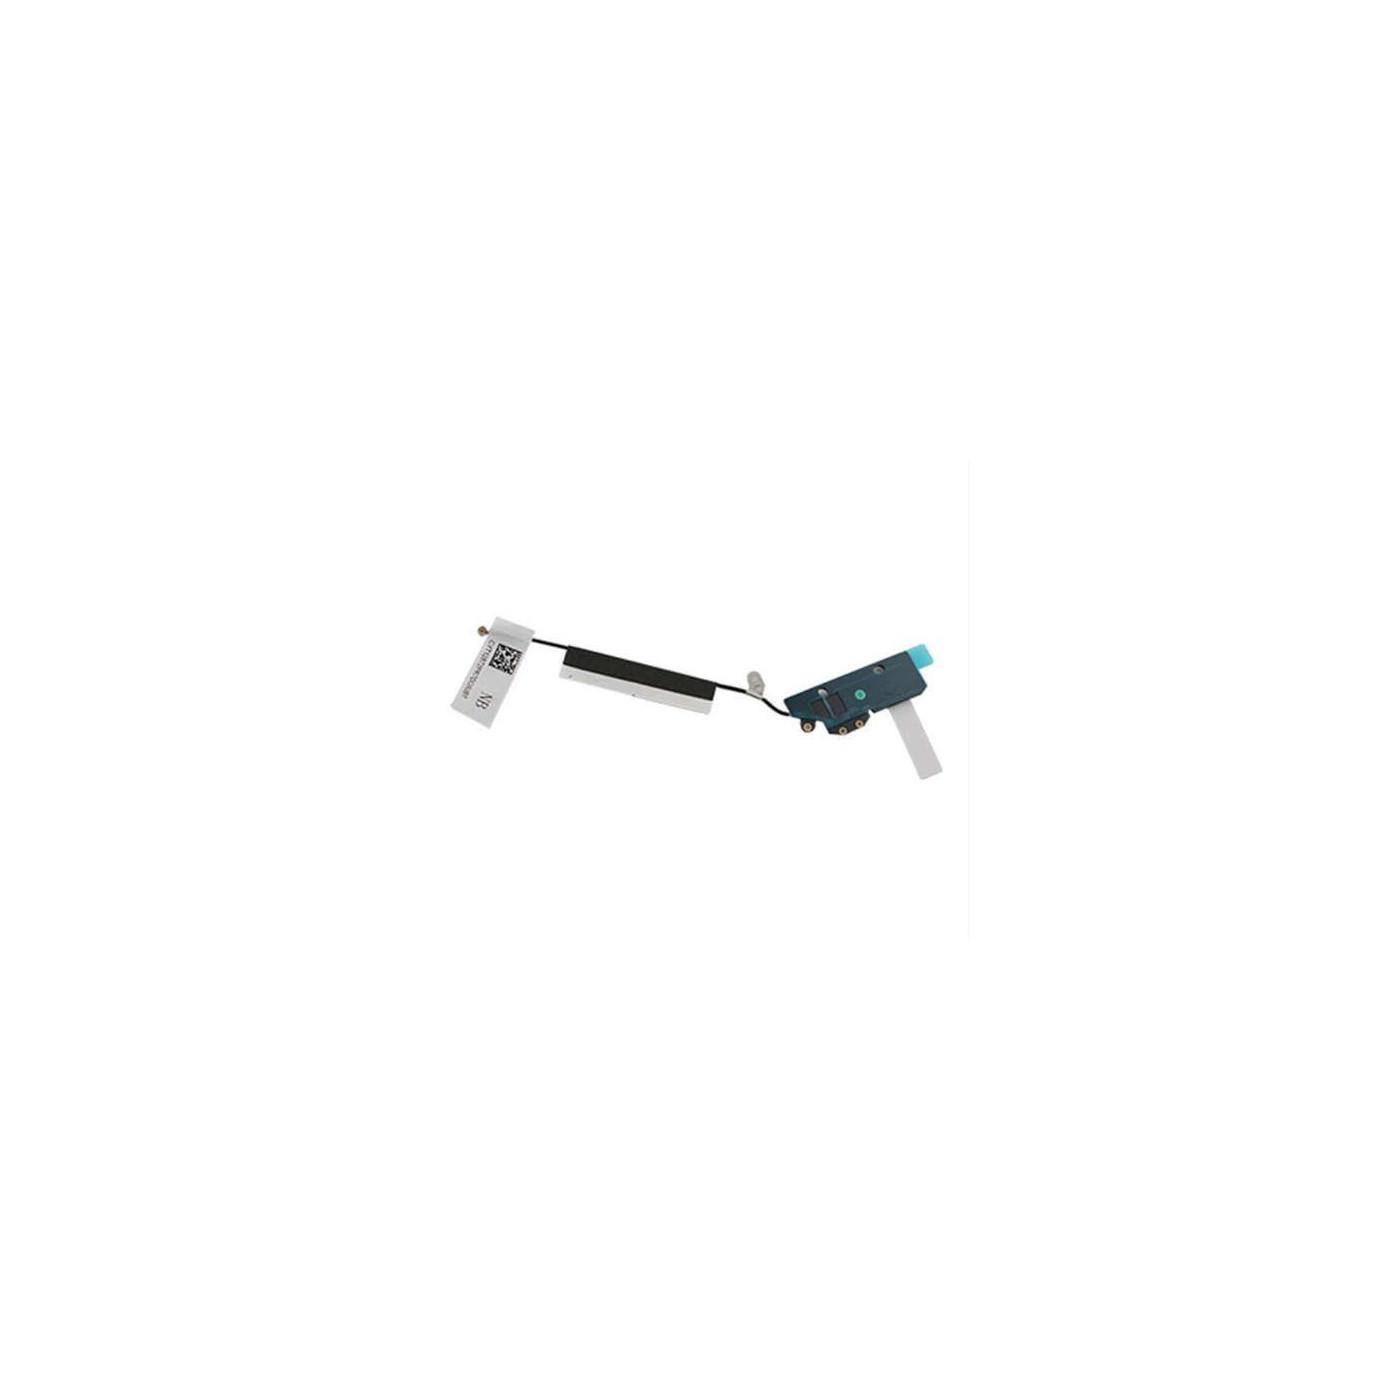 Antenna wifi bluetooth per apple ipad 2 flex cable ricambio